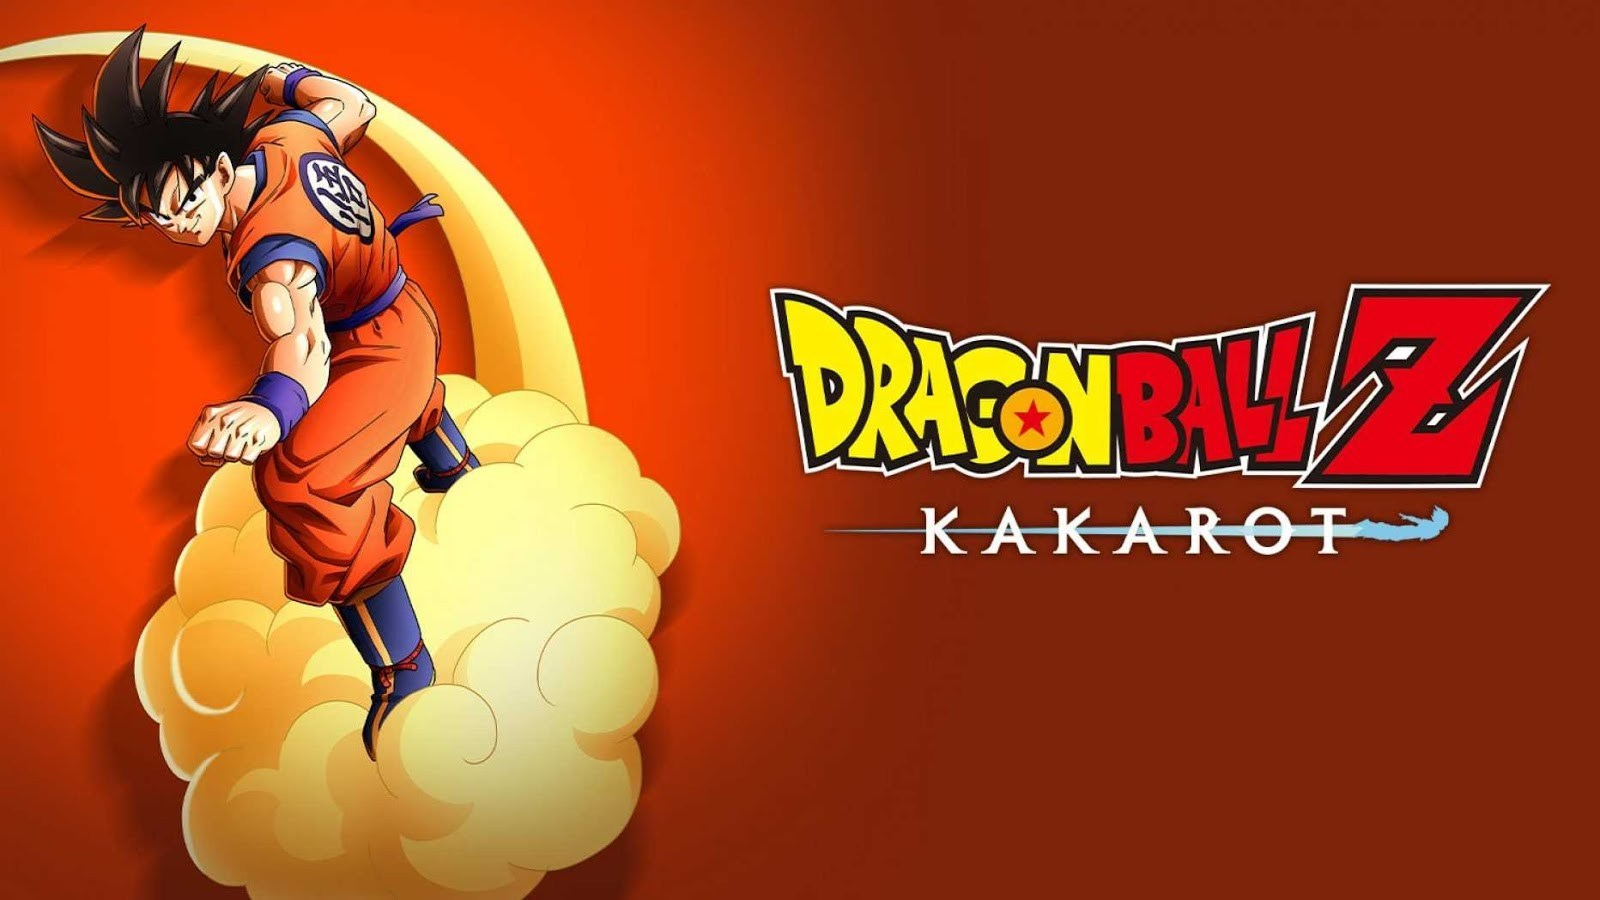 Dragon Ball Z: Kakarot PC + DLC Codex PC Game For Free Download